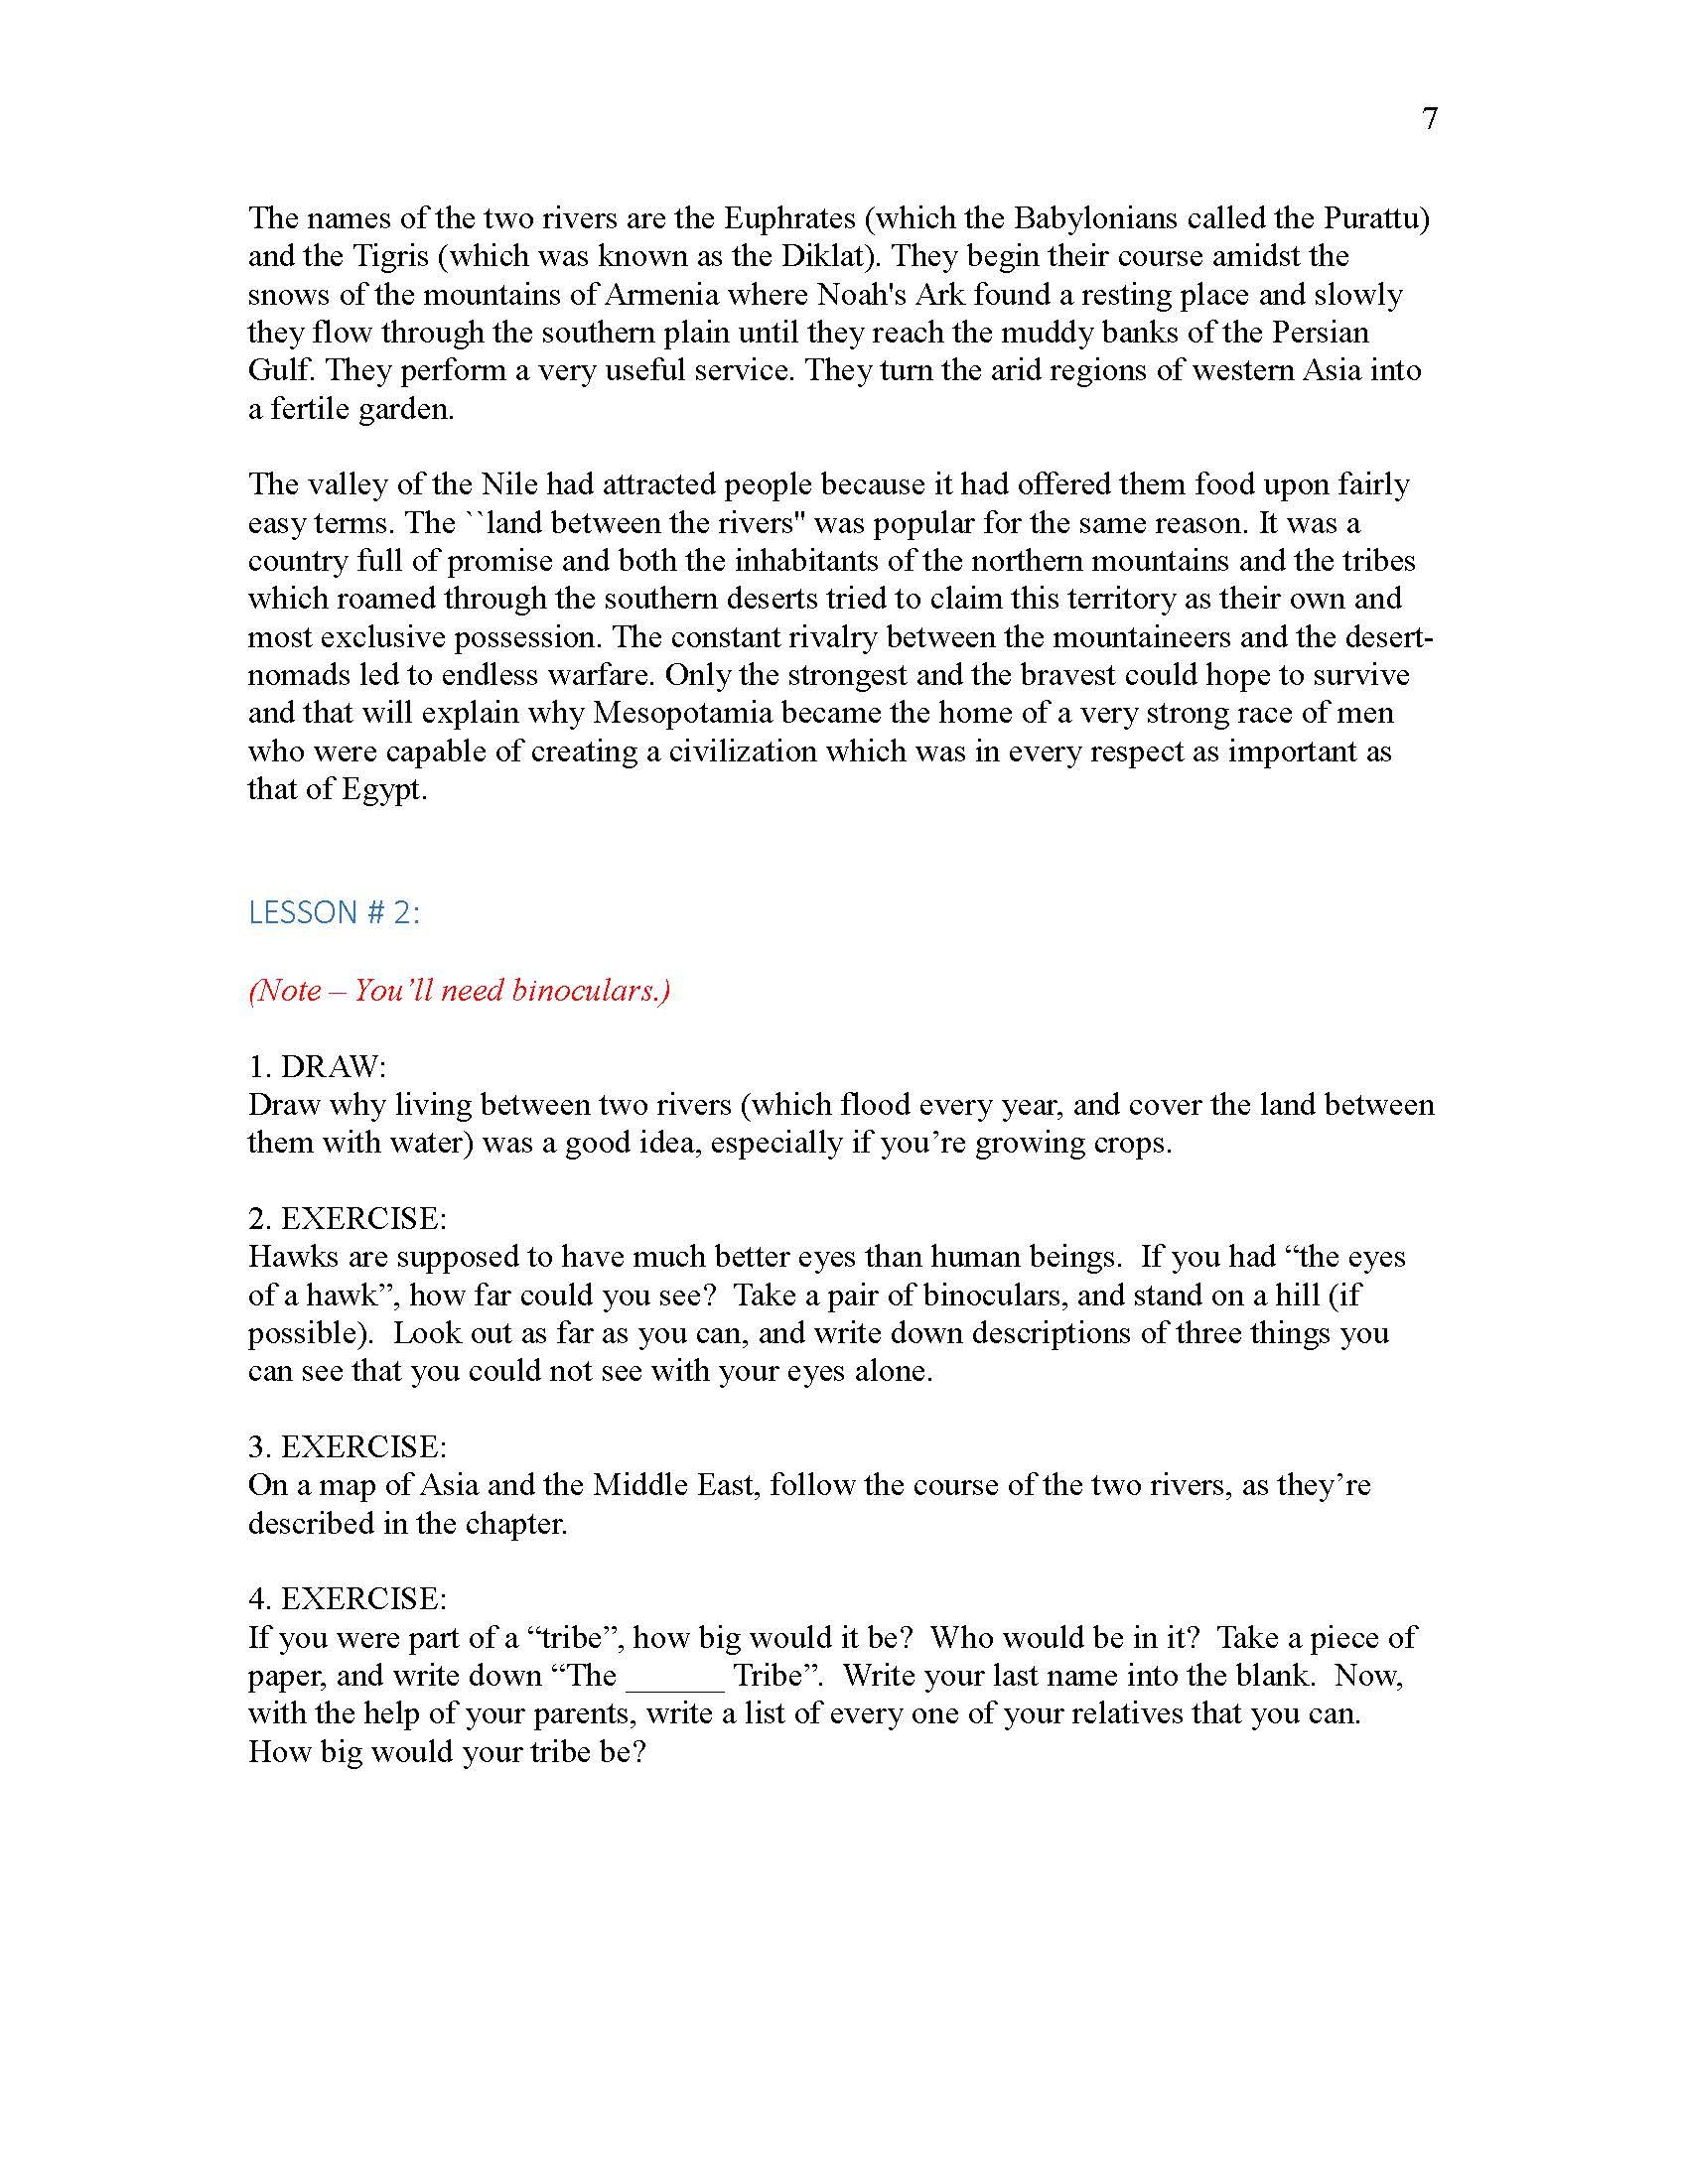 Step 3 History 3 - Mesopotamia & Moses_Page_08.jpg